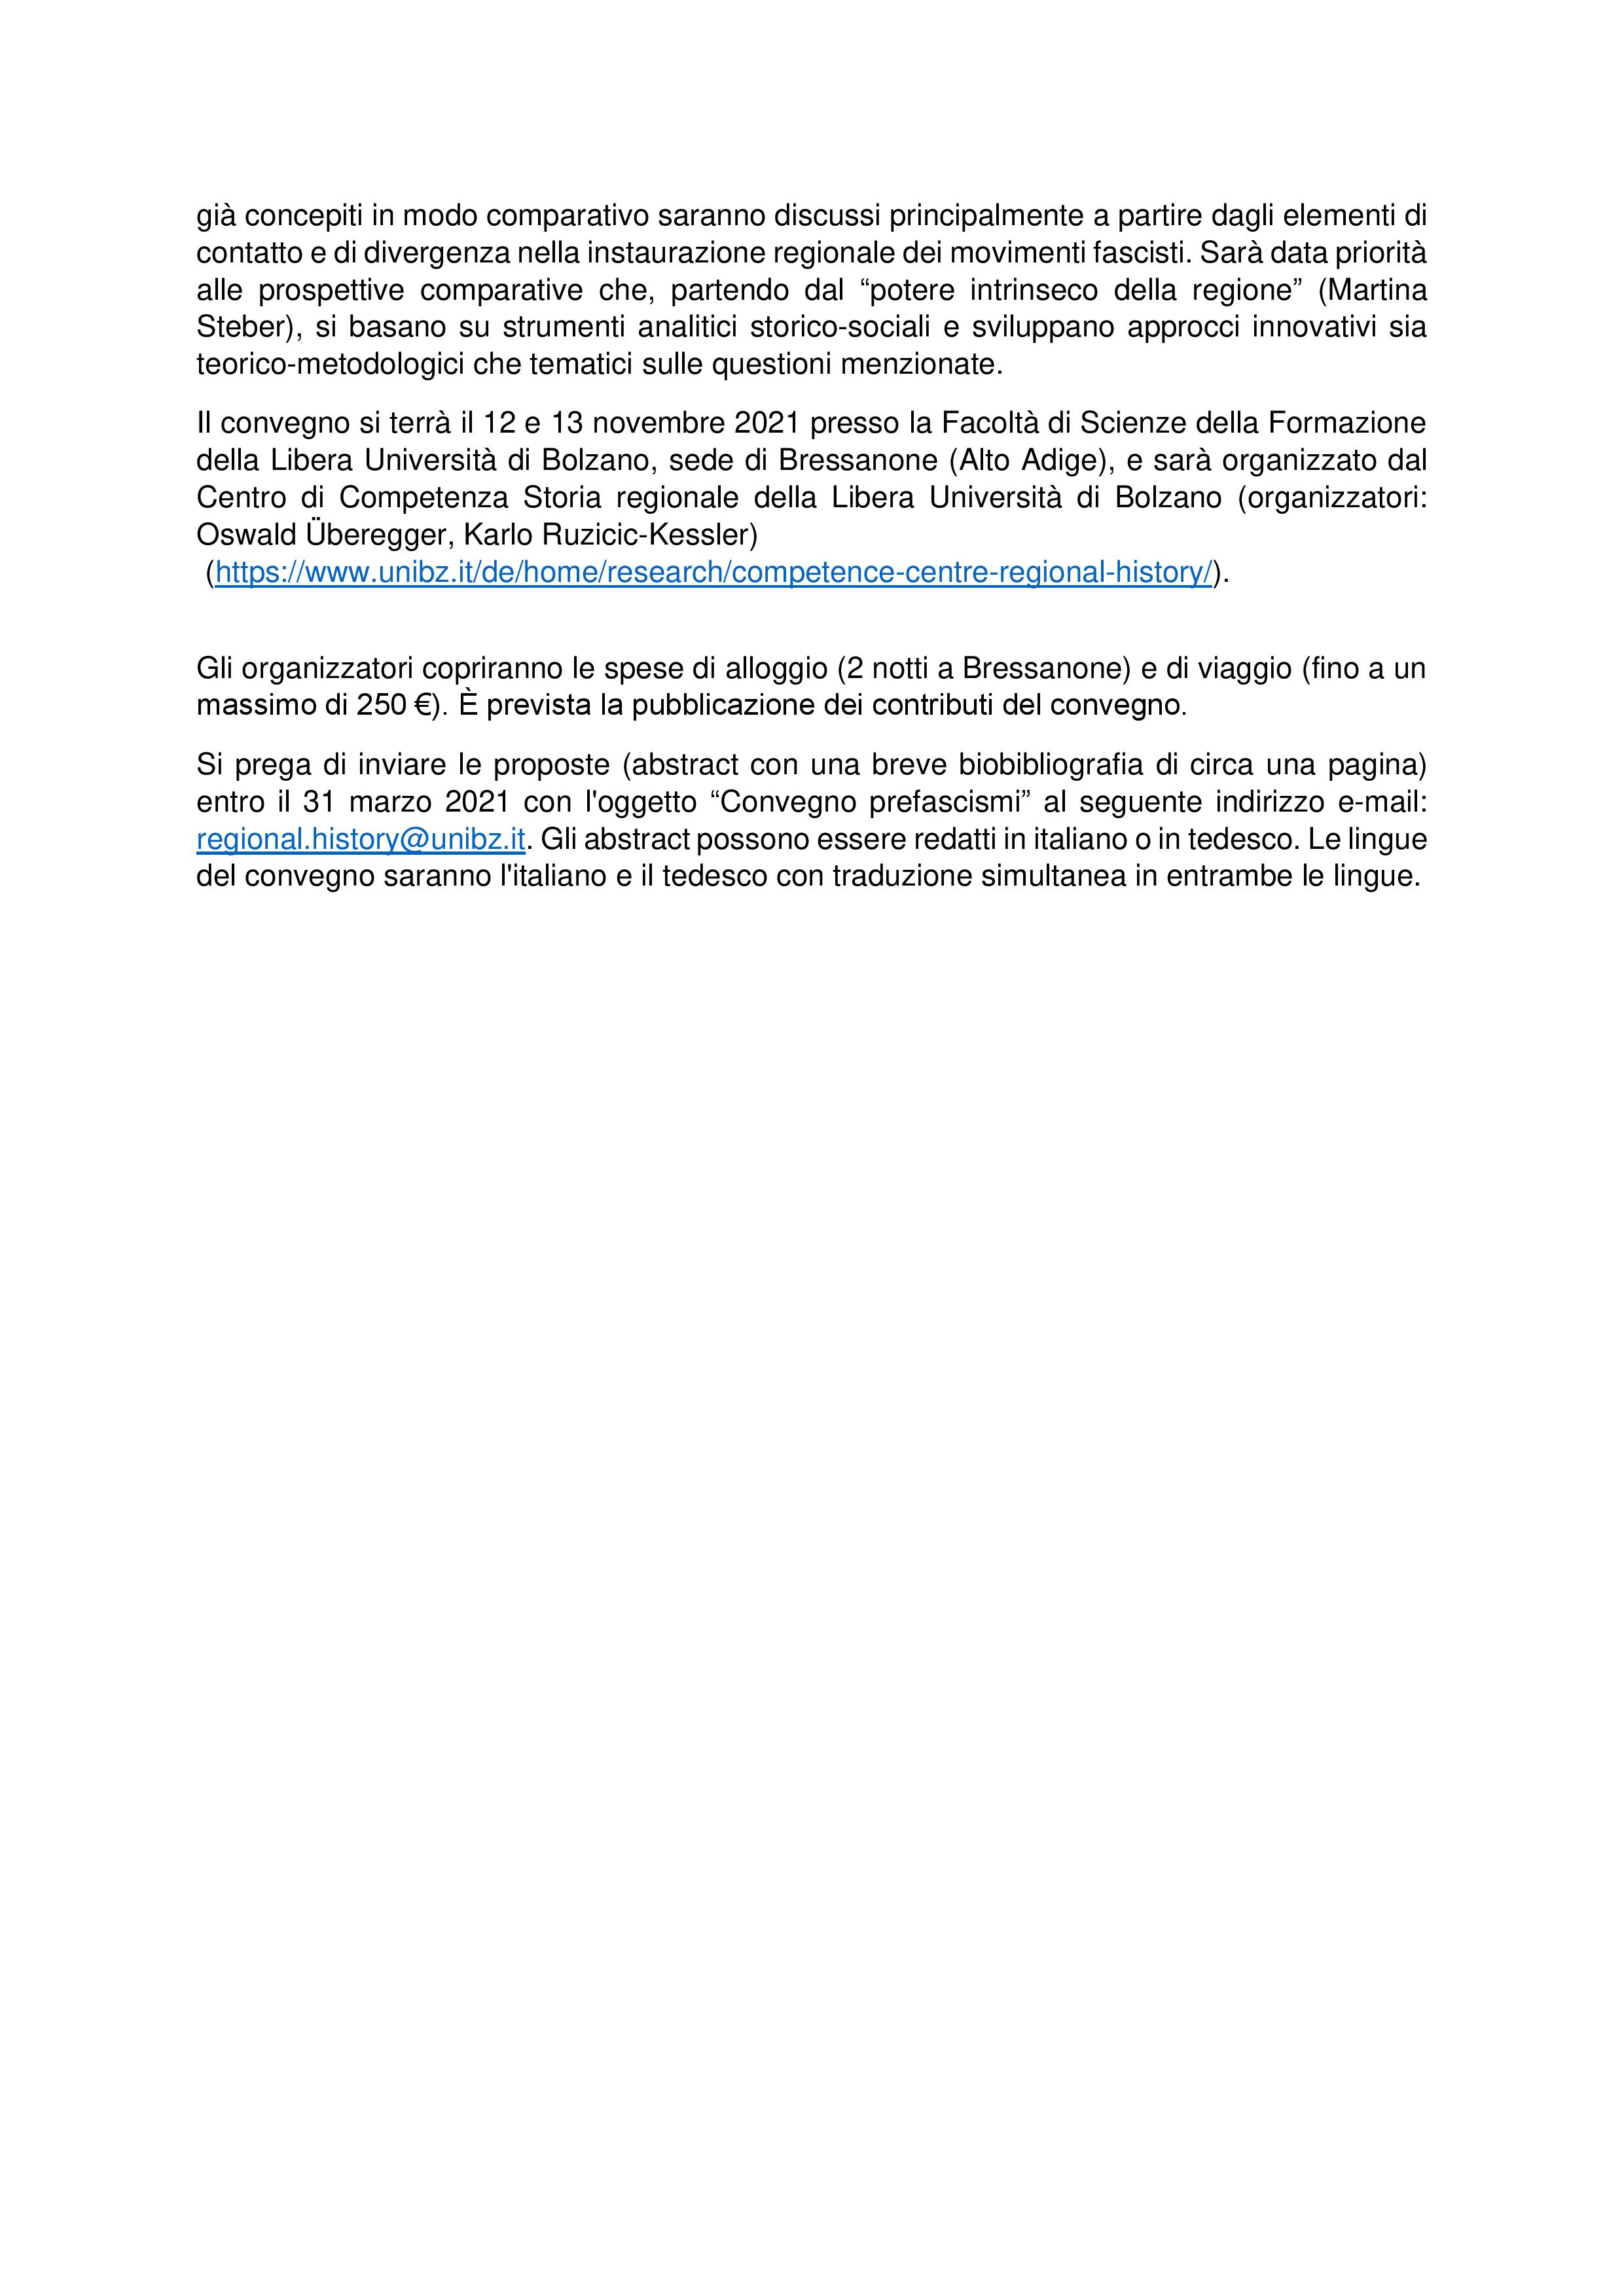 CfP_Prefascismi-page-003